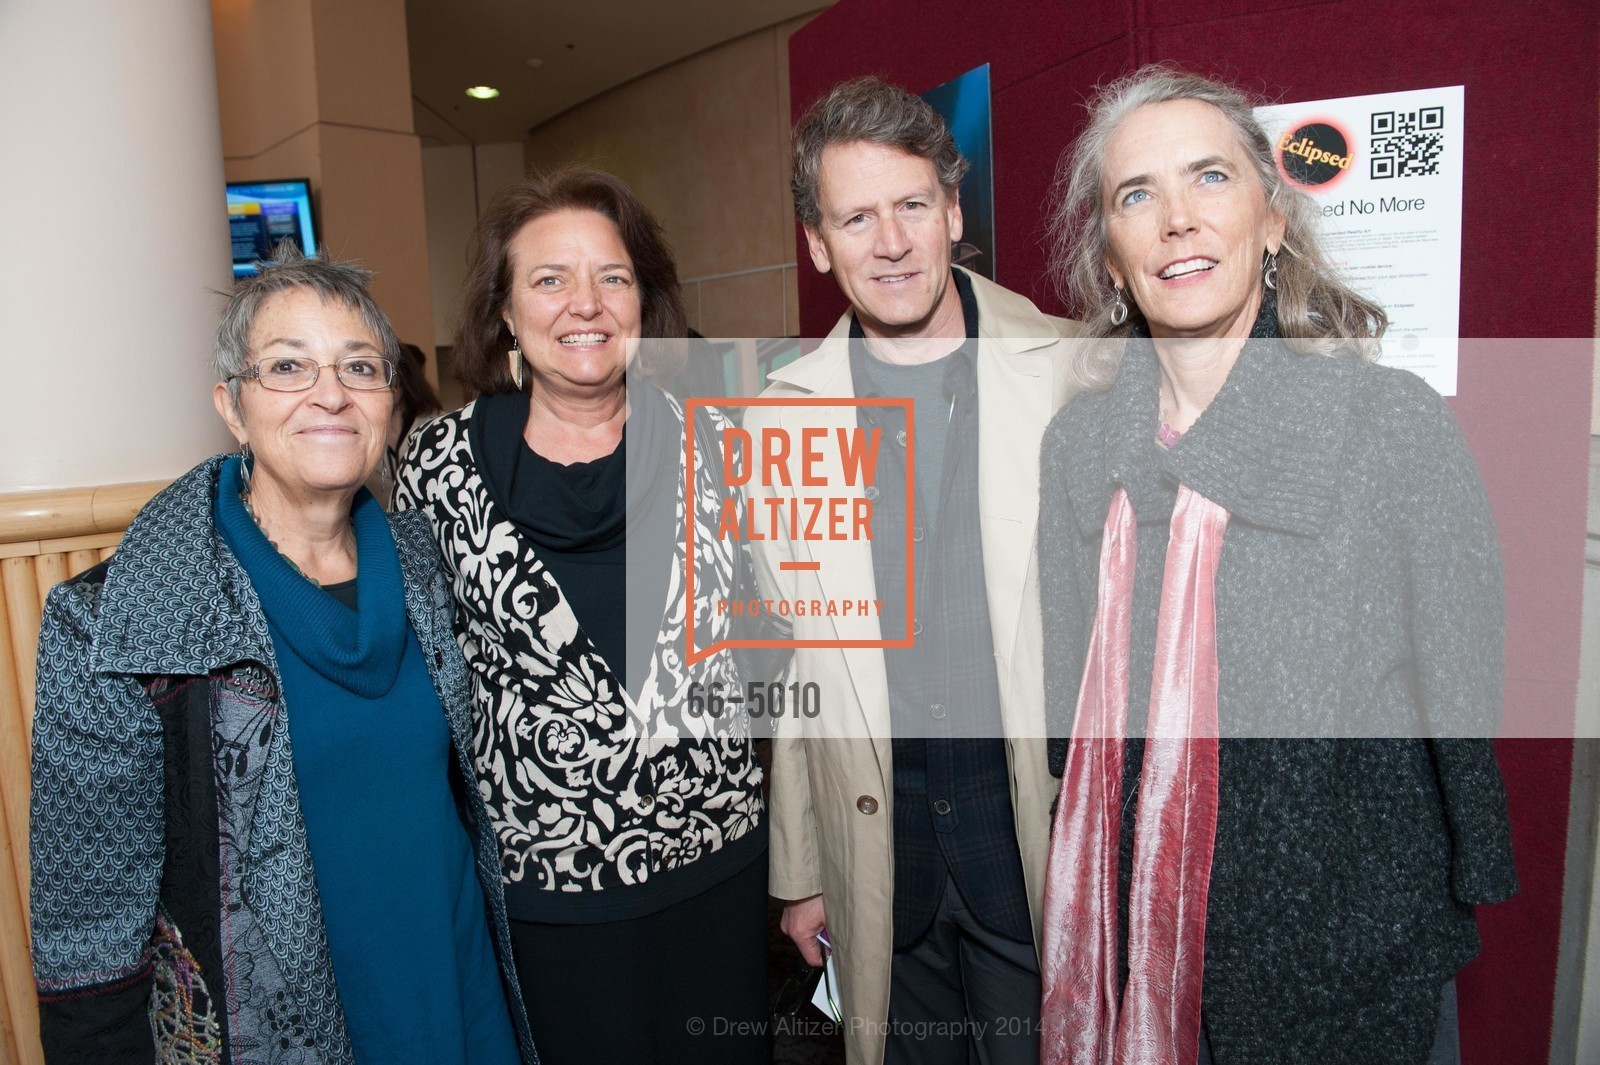 Lisa Webster, Linda Stevenin, Daniel Garber, Catherine Garber, Photo #66-5010